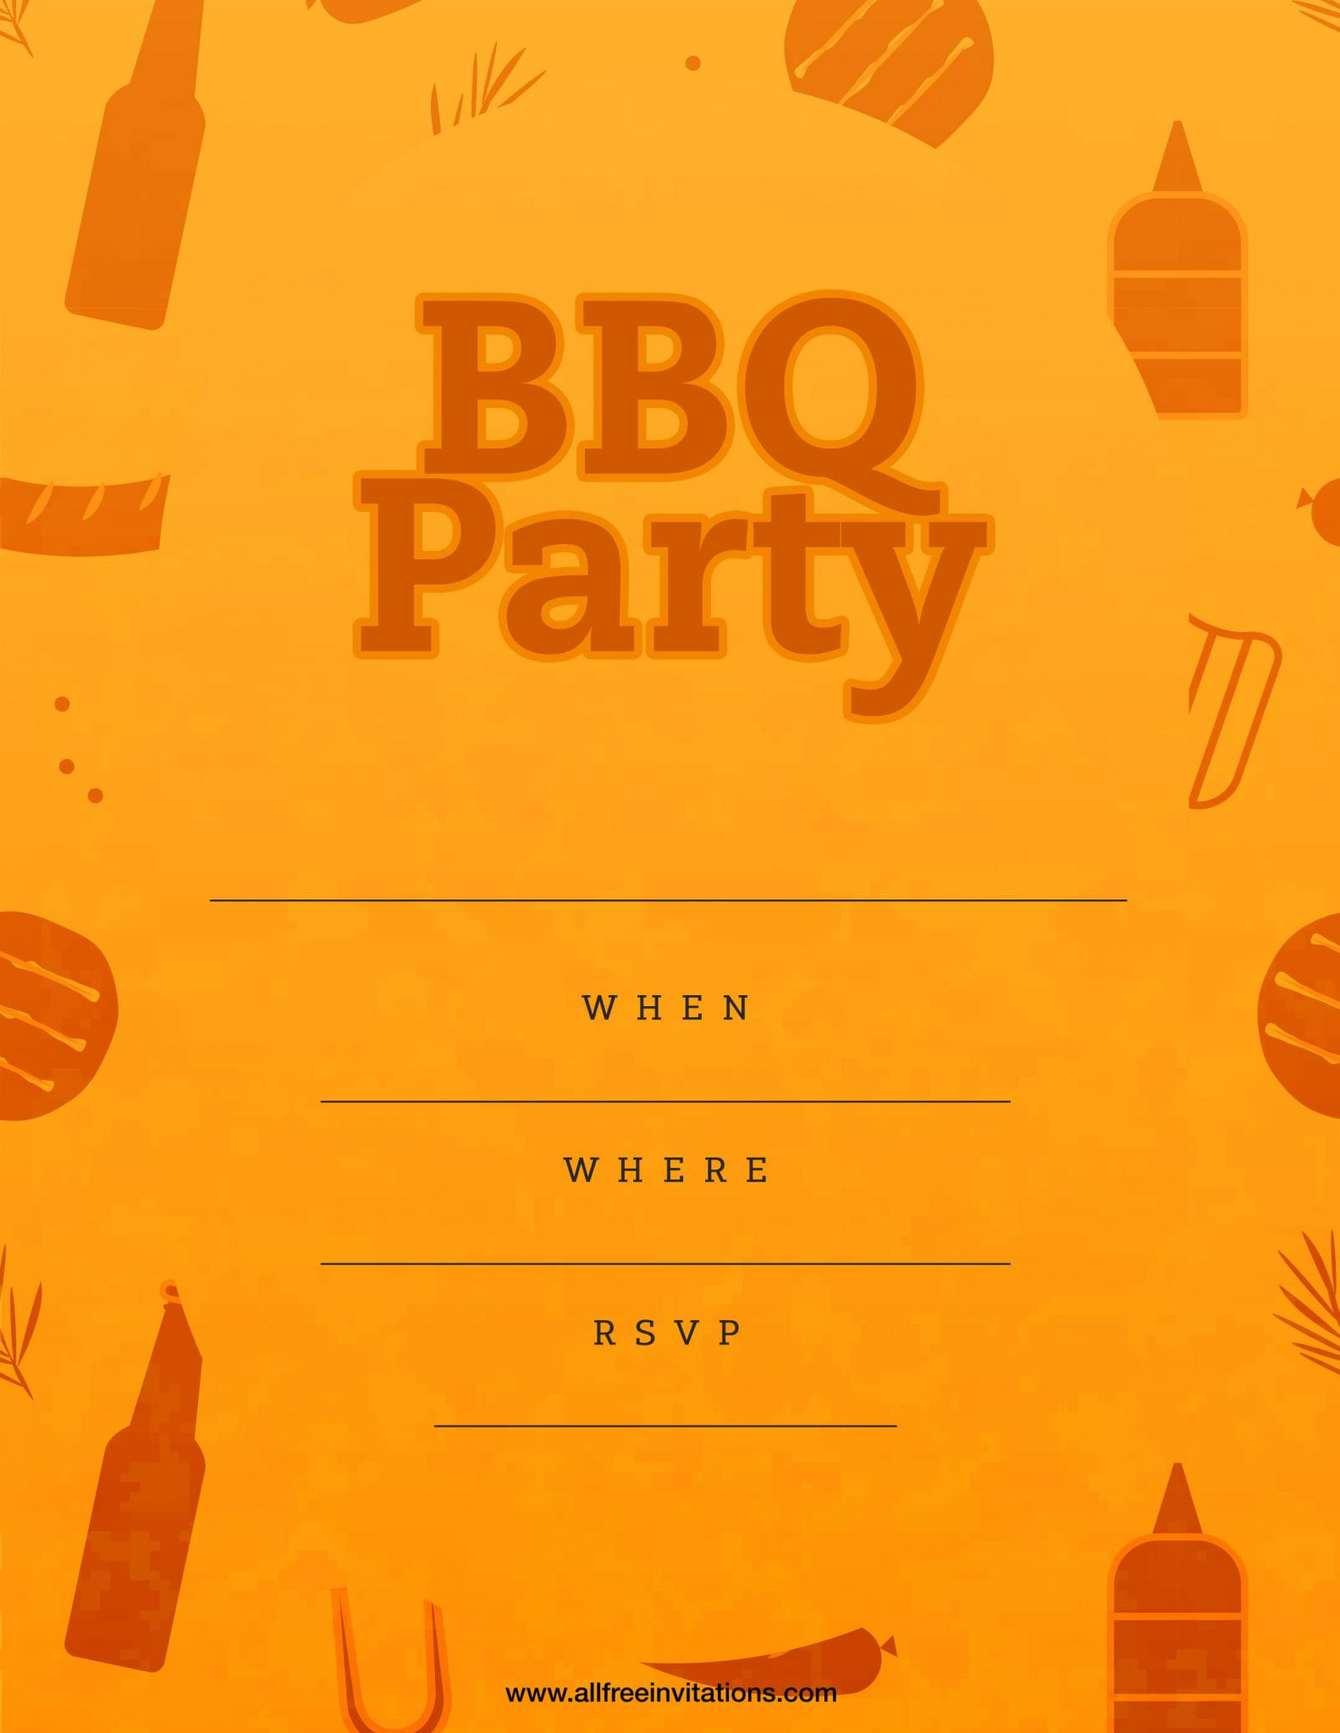 Bbq party invitation funky orange design